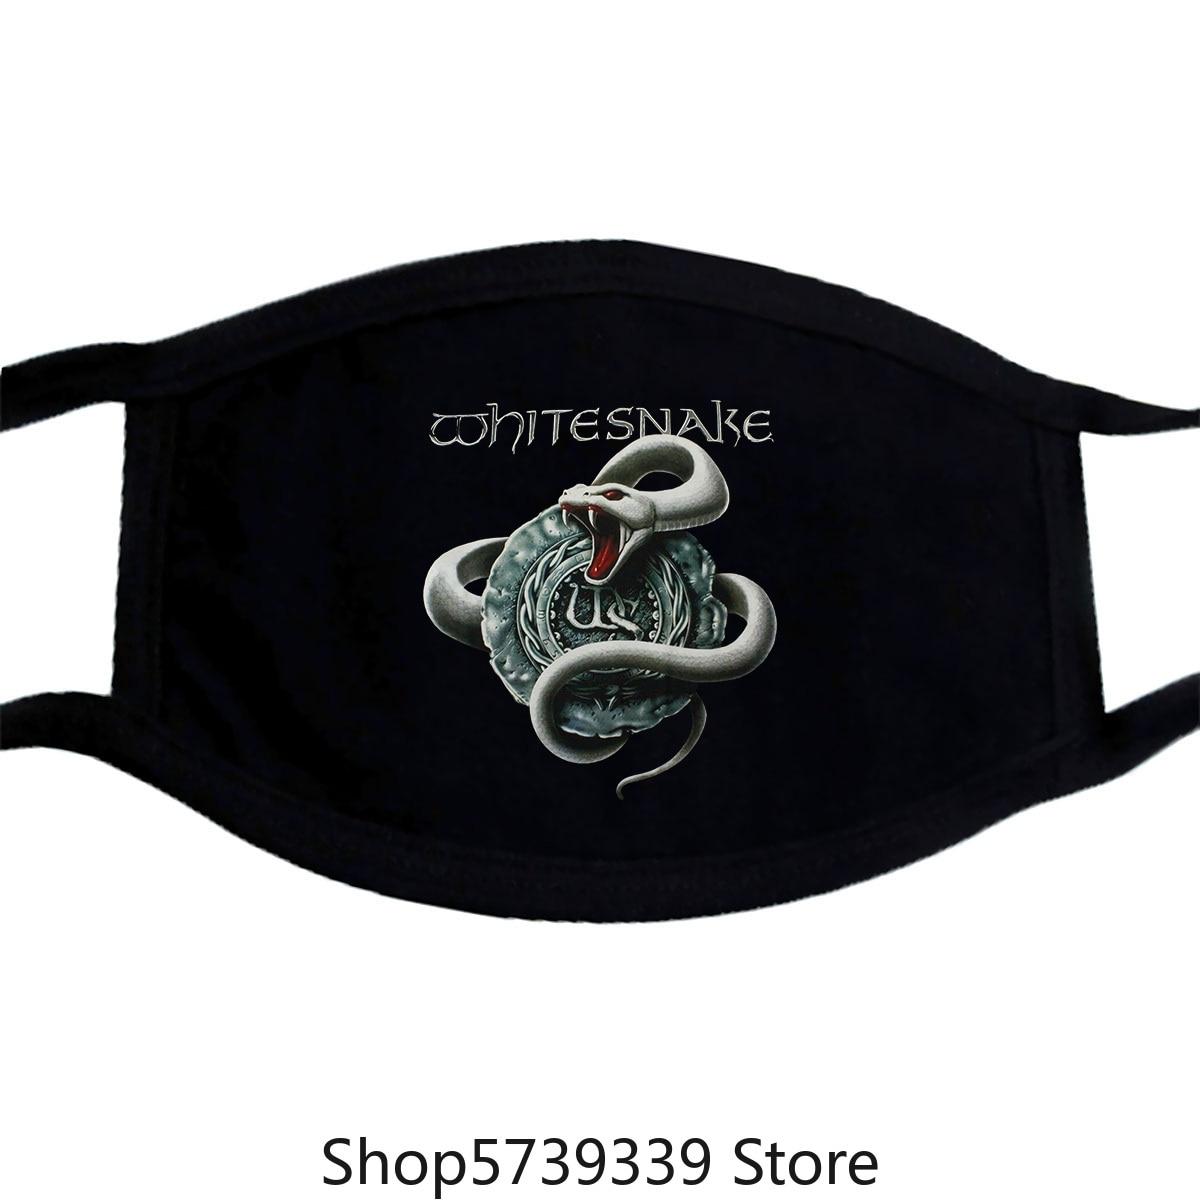 Whitesnake White Snake David Coverdale Hard Rock Deep Purple New Black Mask Washable Reusable Mask with